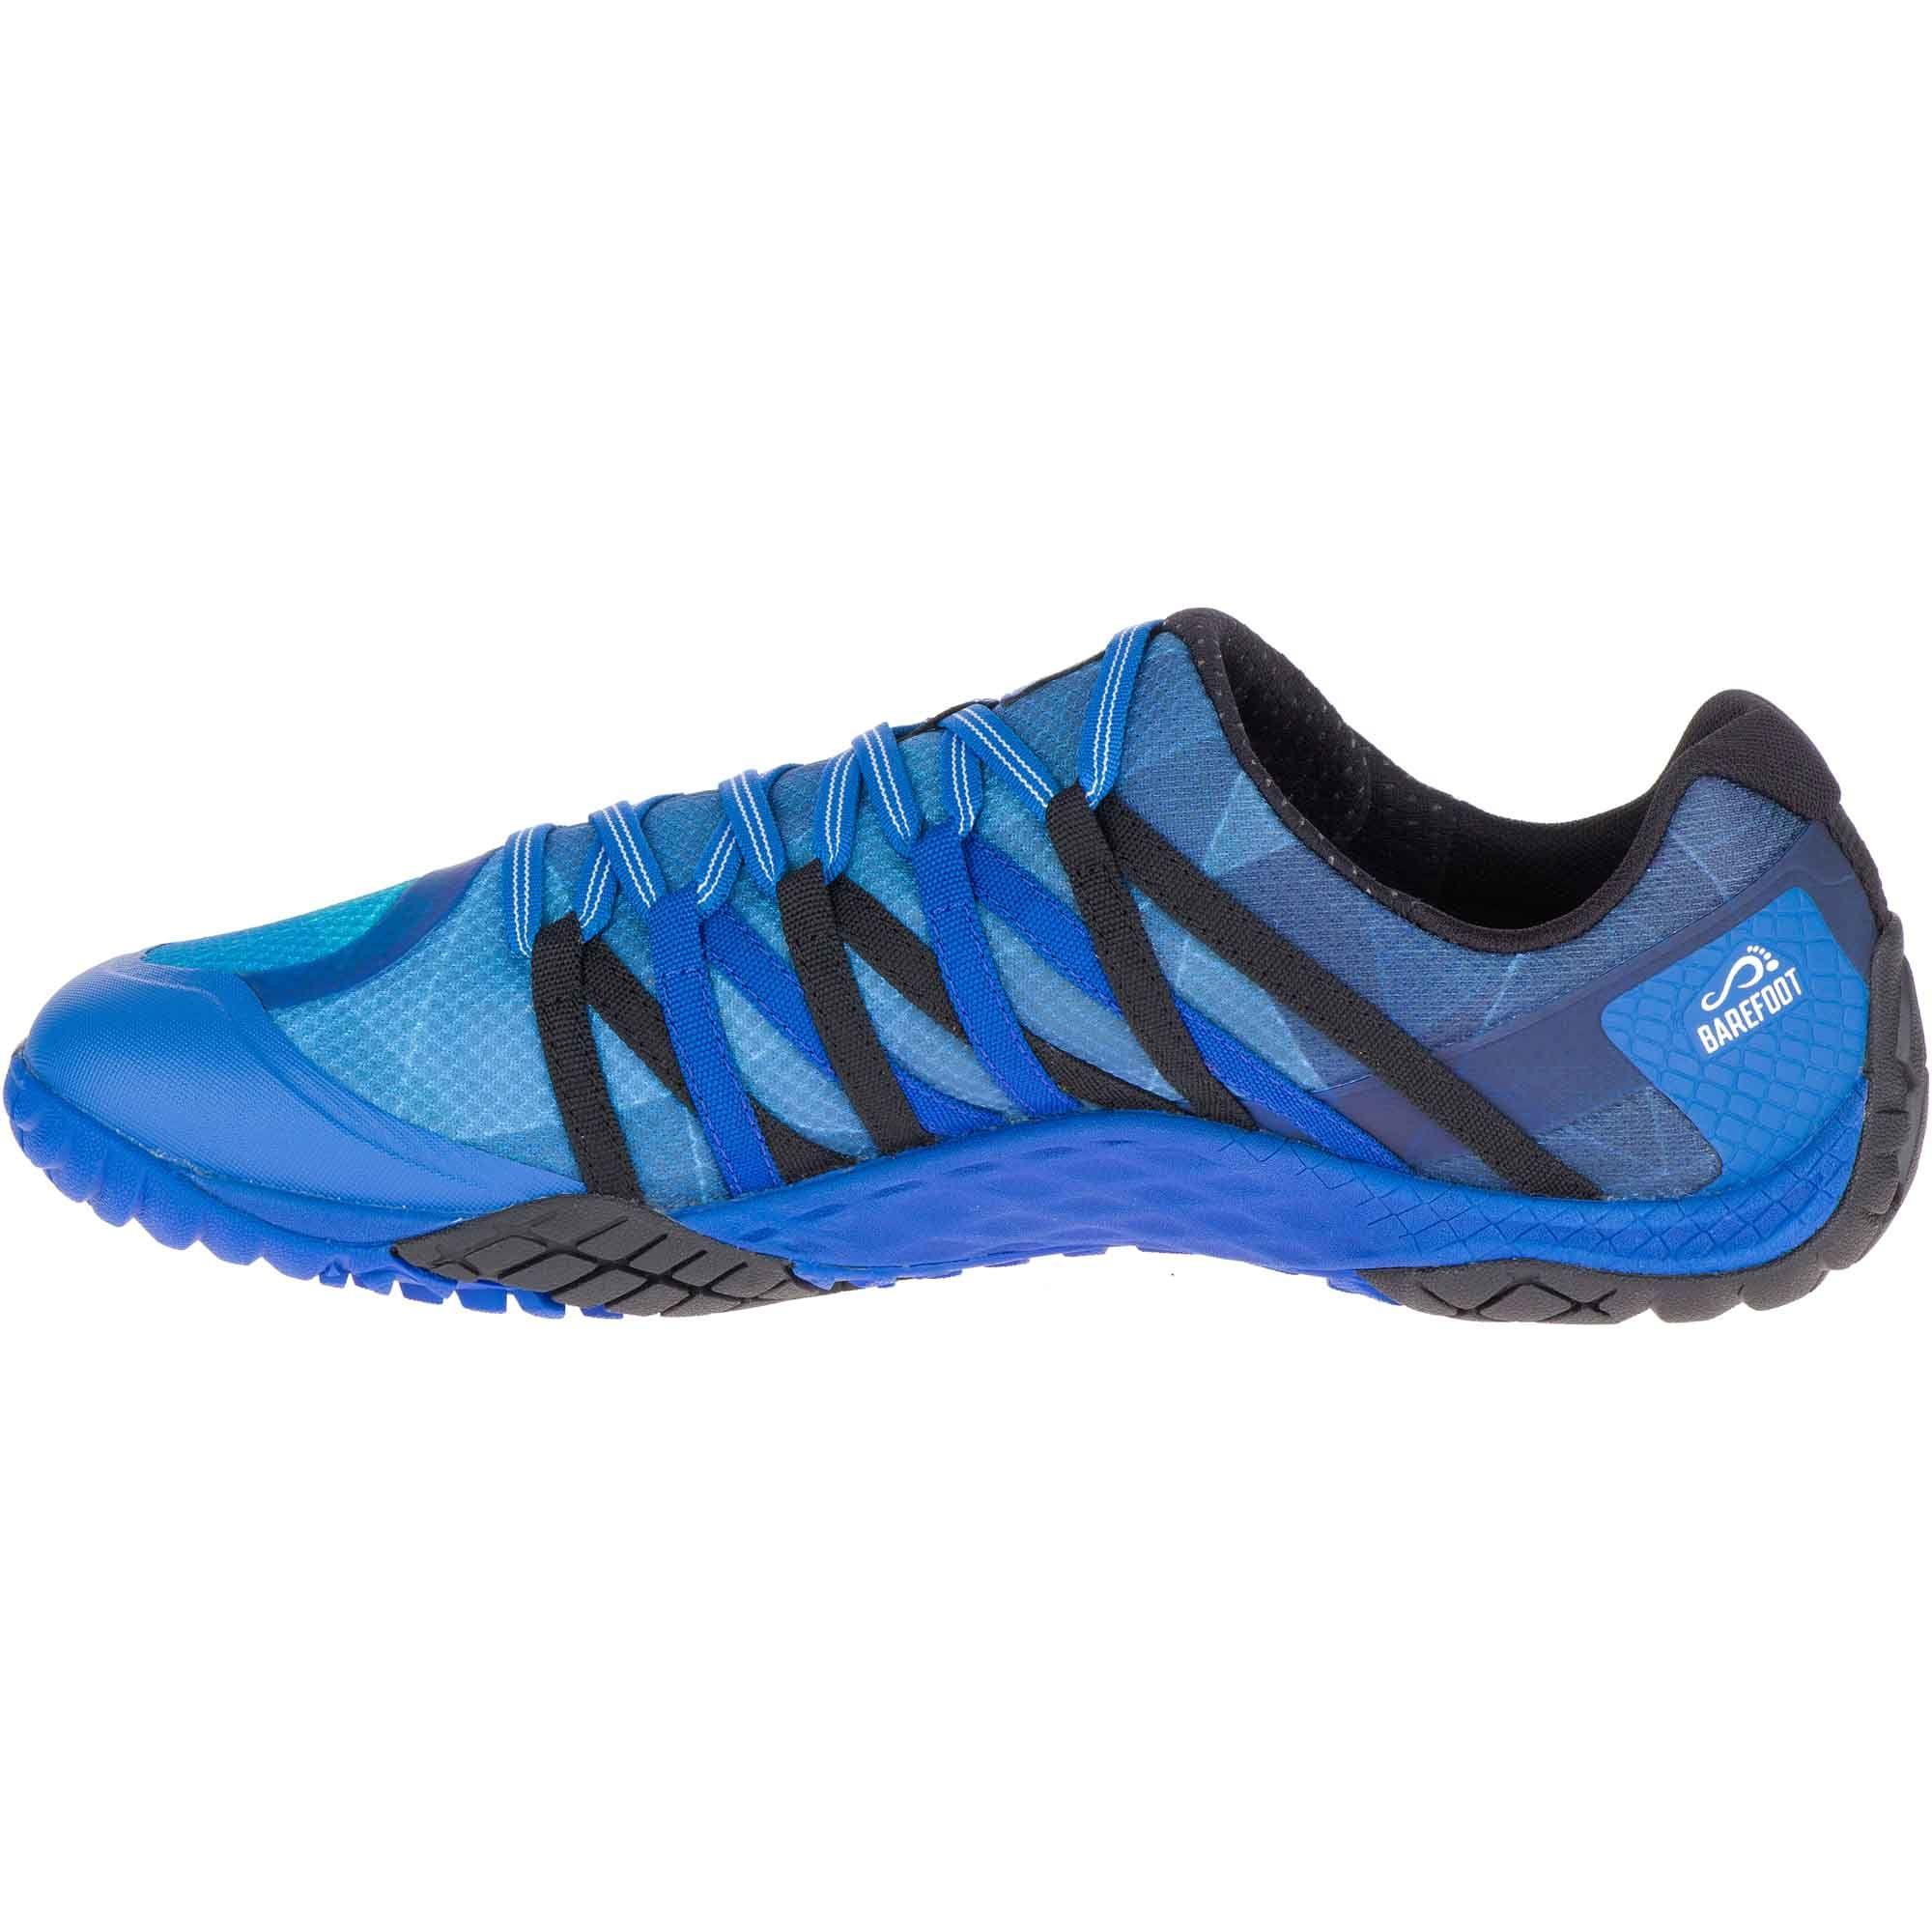 Merrell Barefoot Shoes Mens